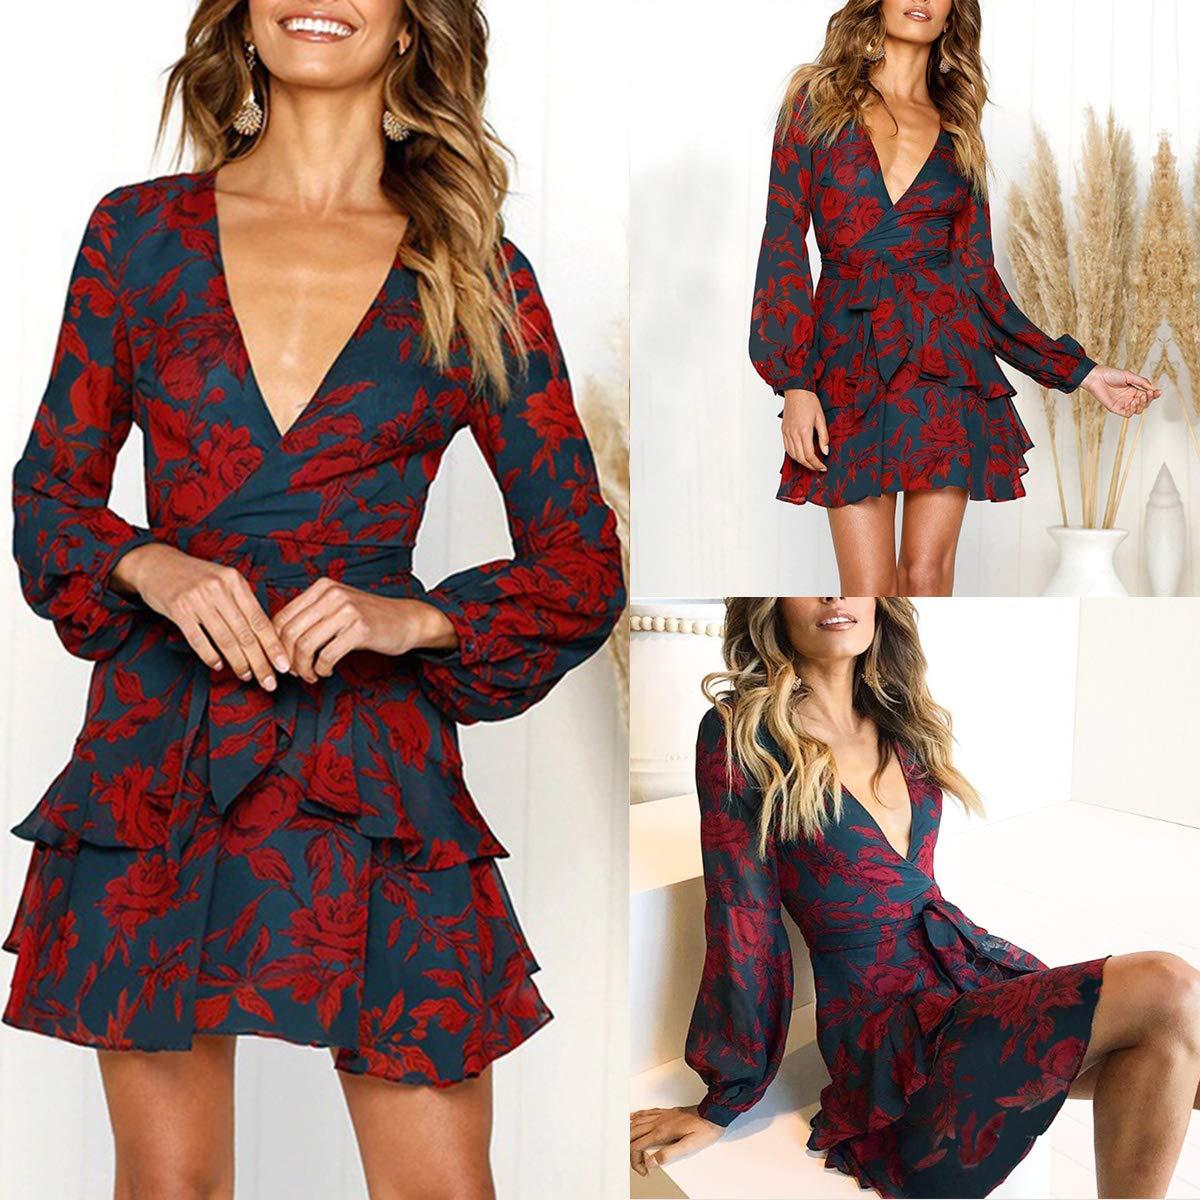 ff17be37e9 Women Casual V Neck Mini Dress Printing Ruffles Dress Long Sleeve Bow  Ruffles Wrap at Amazon Women s Clothing store